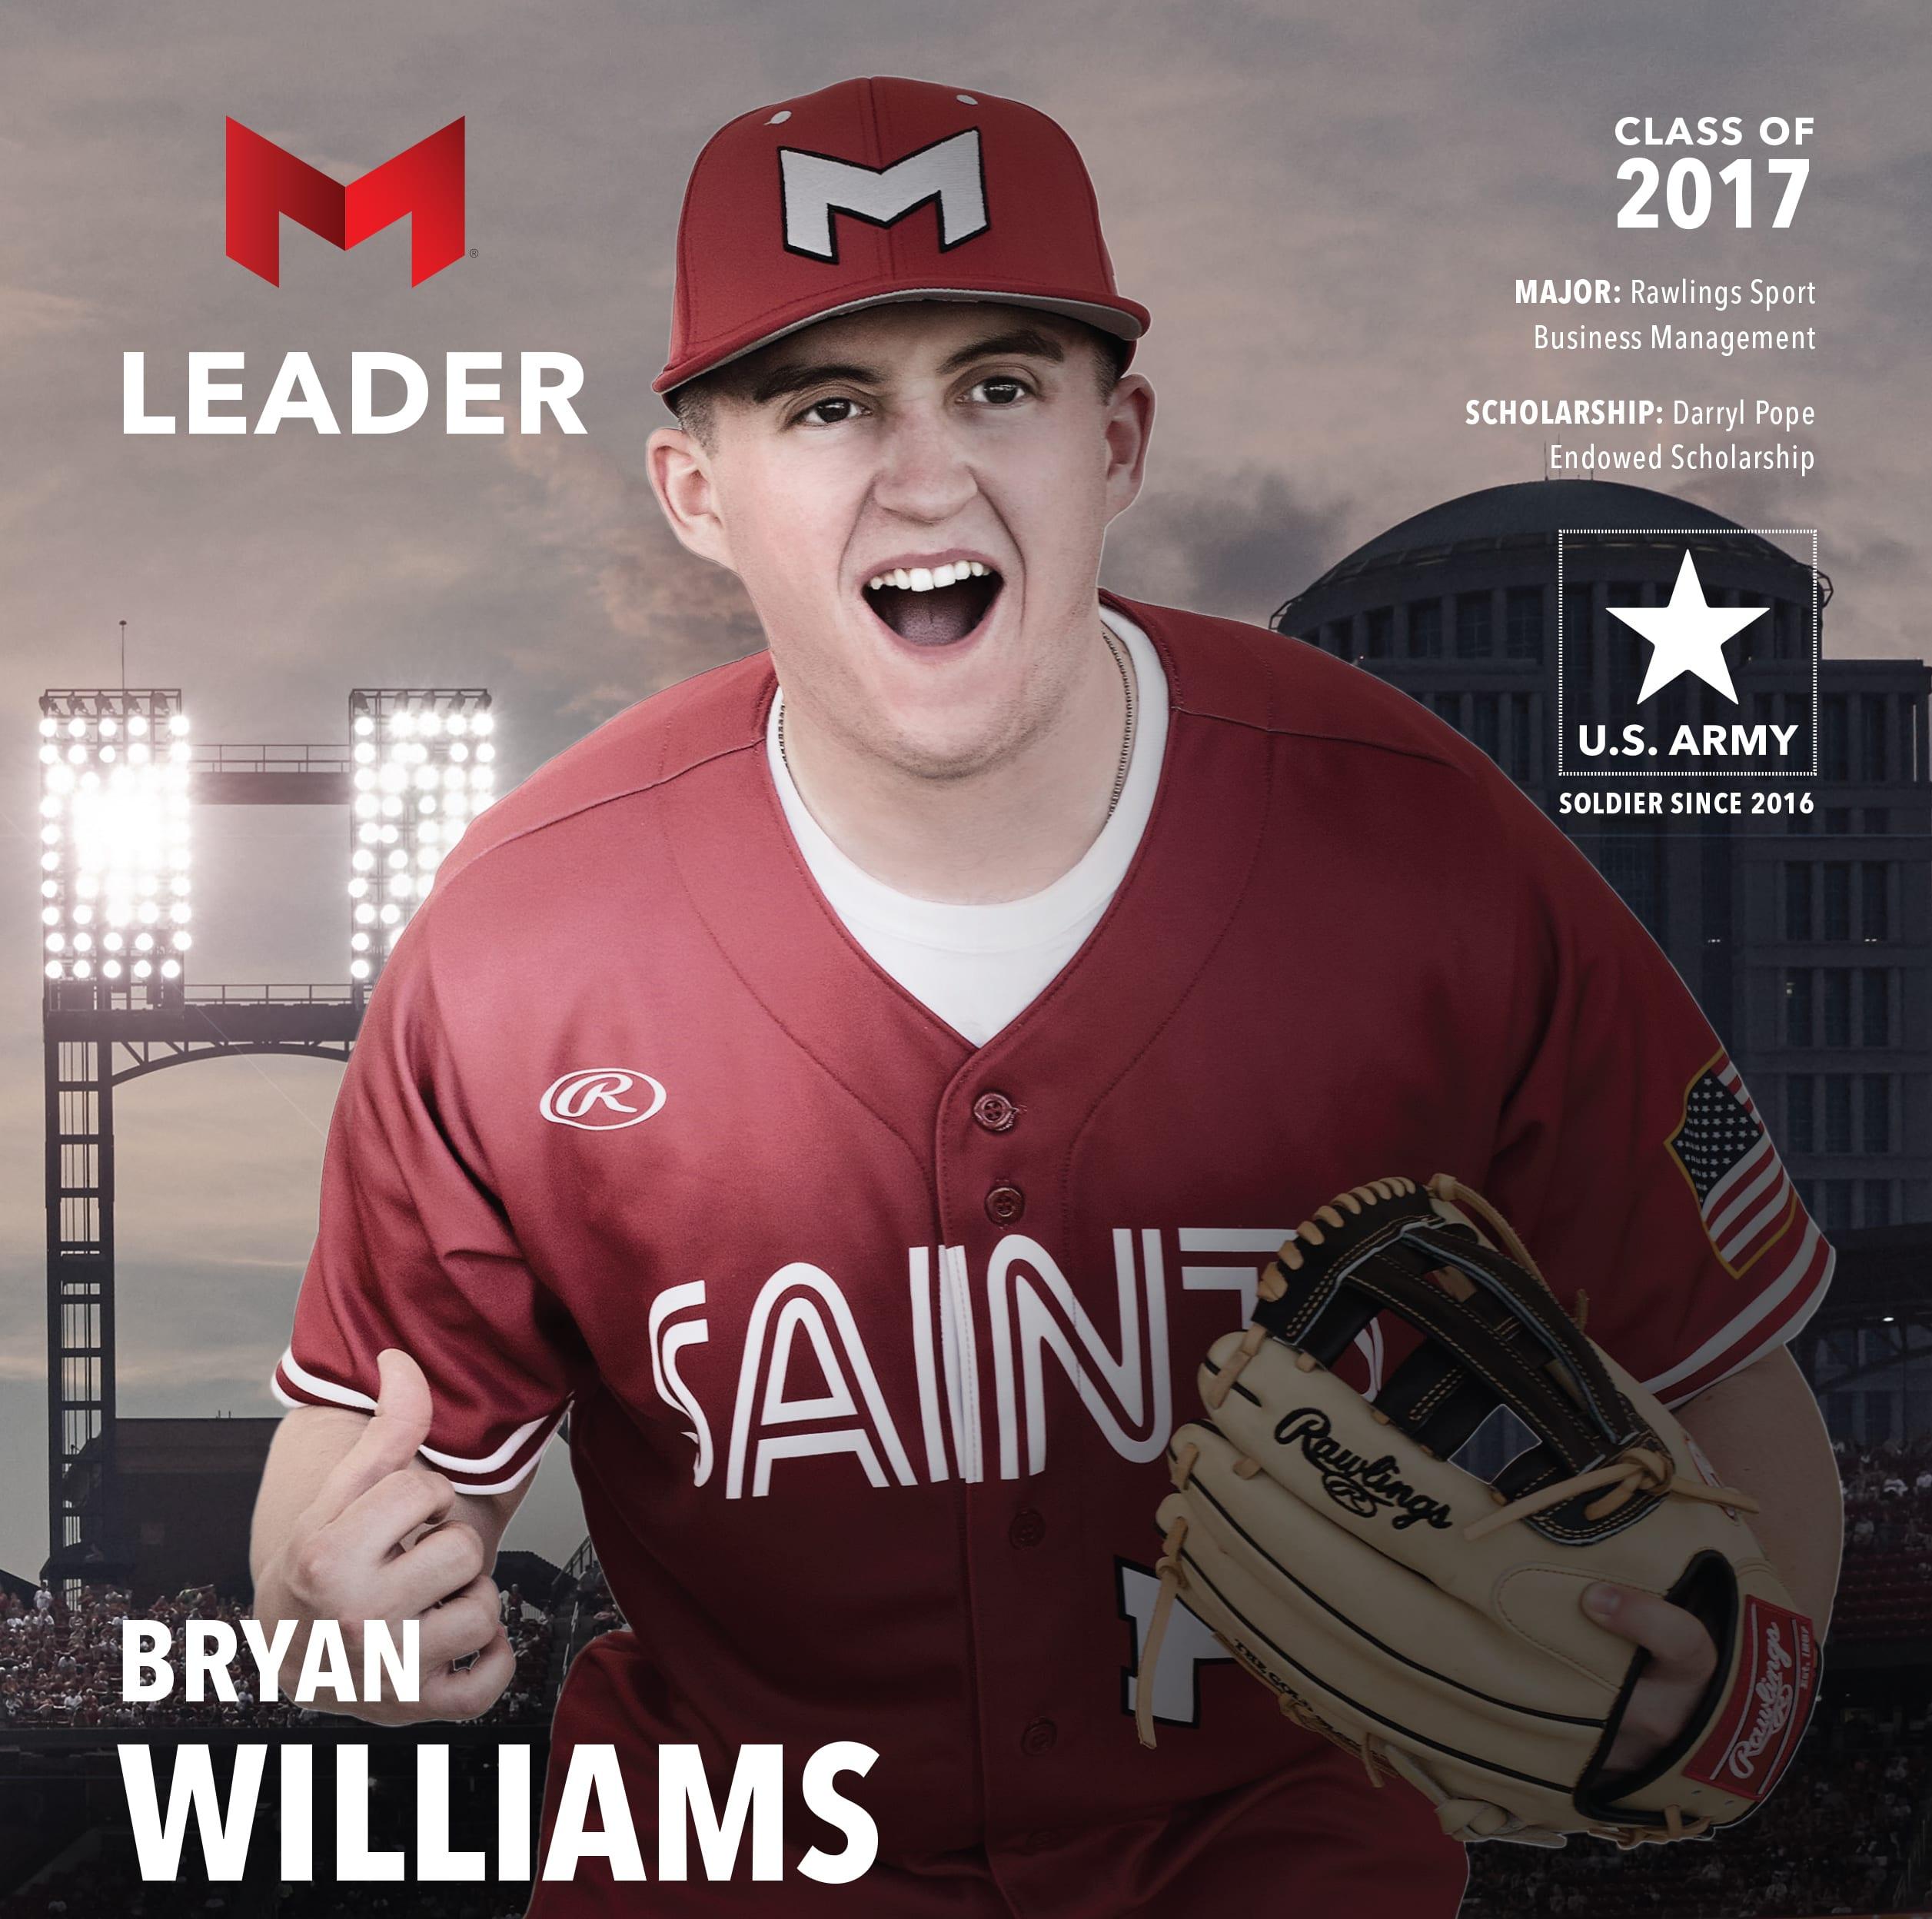 All-Star Bryan Williams